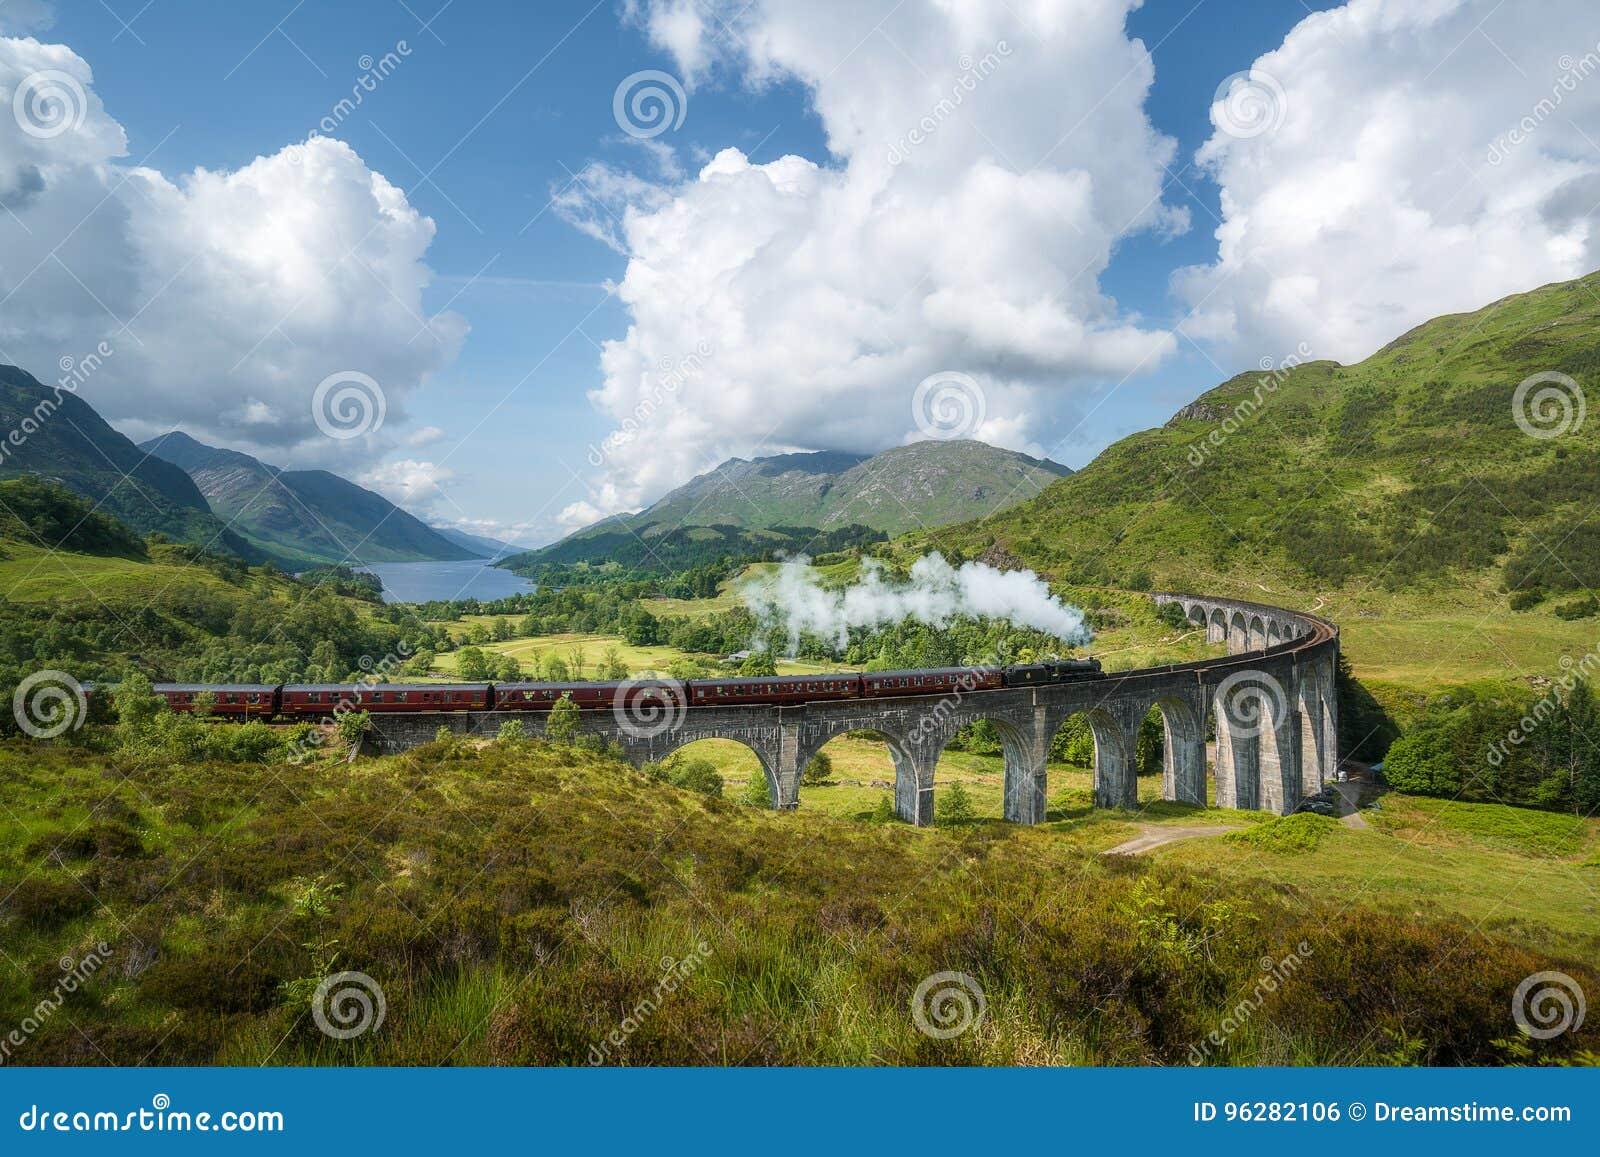 Treno a vapore di Jacobite, a k a Hogwarts preciso, viadotto di Glenfinnan dei passaggi